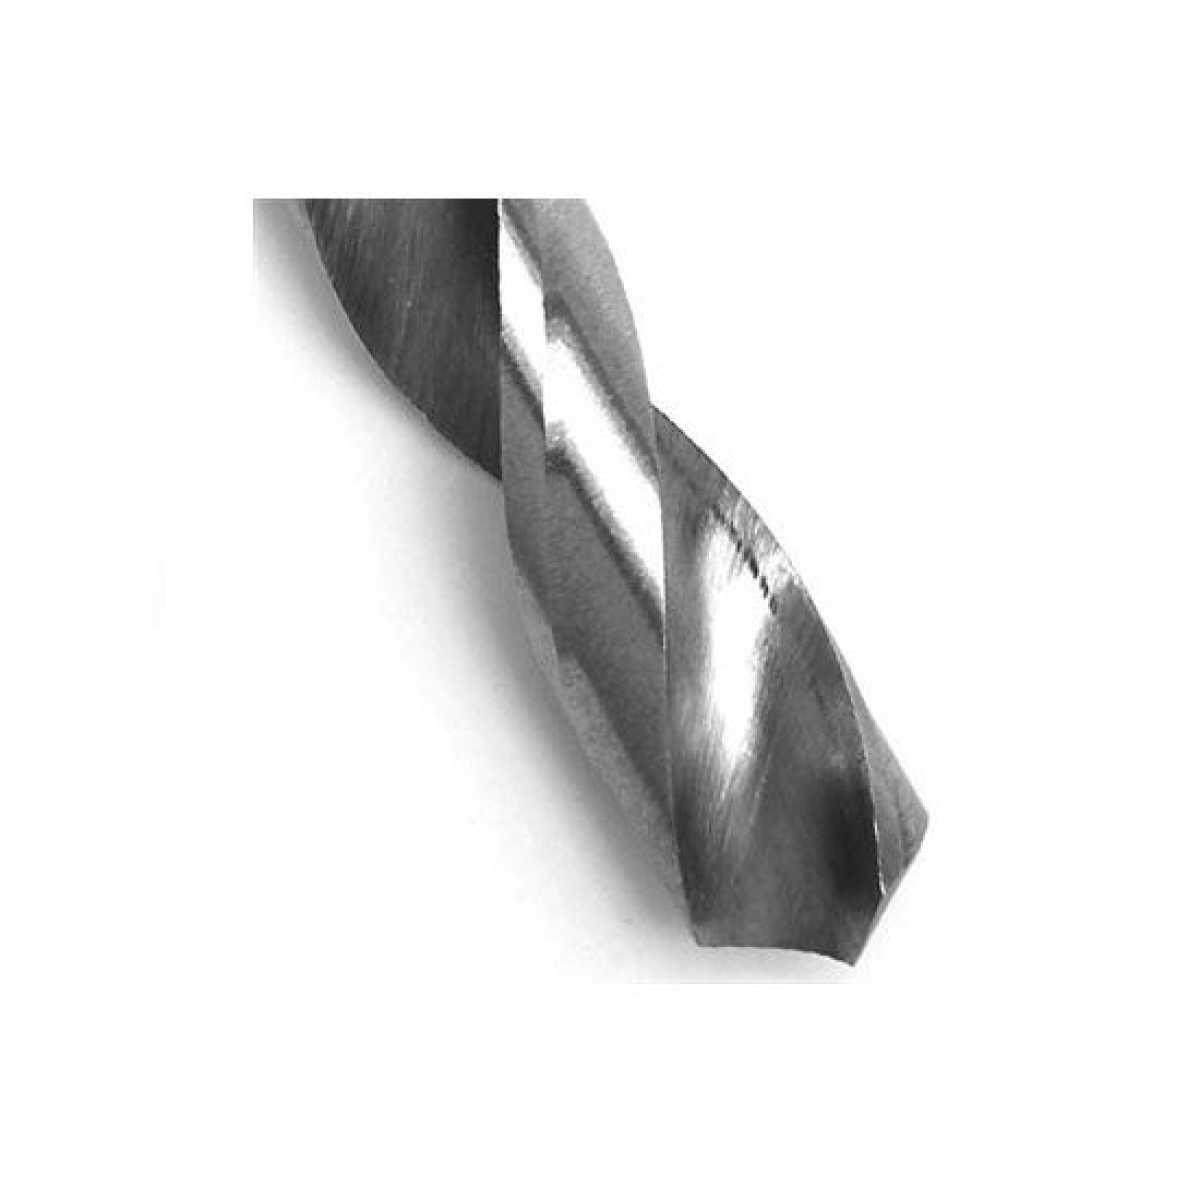 Broca Aço Rápido 8 MM Din338 Rocast Perfection